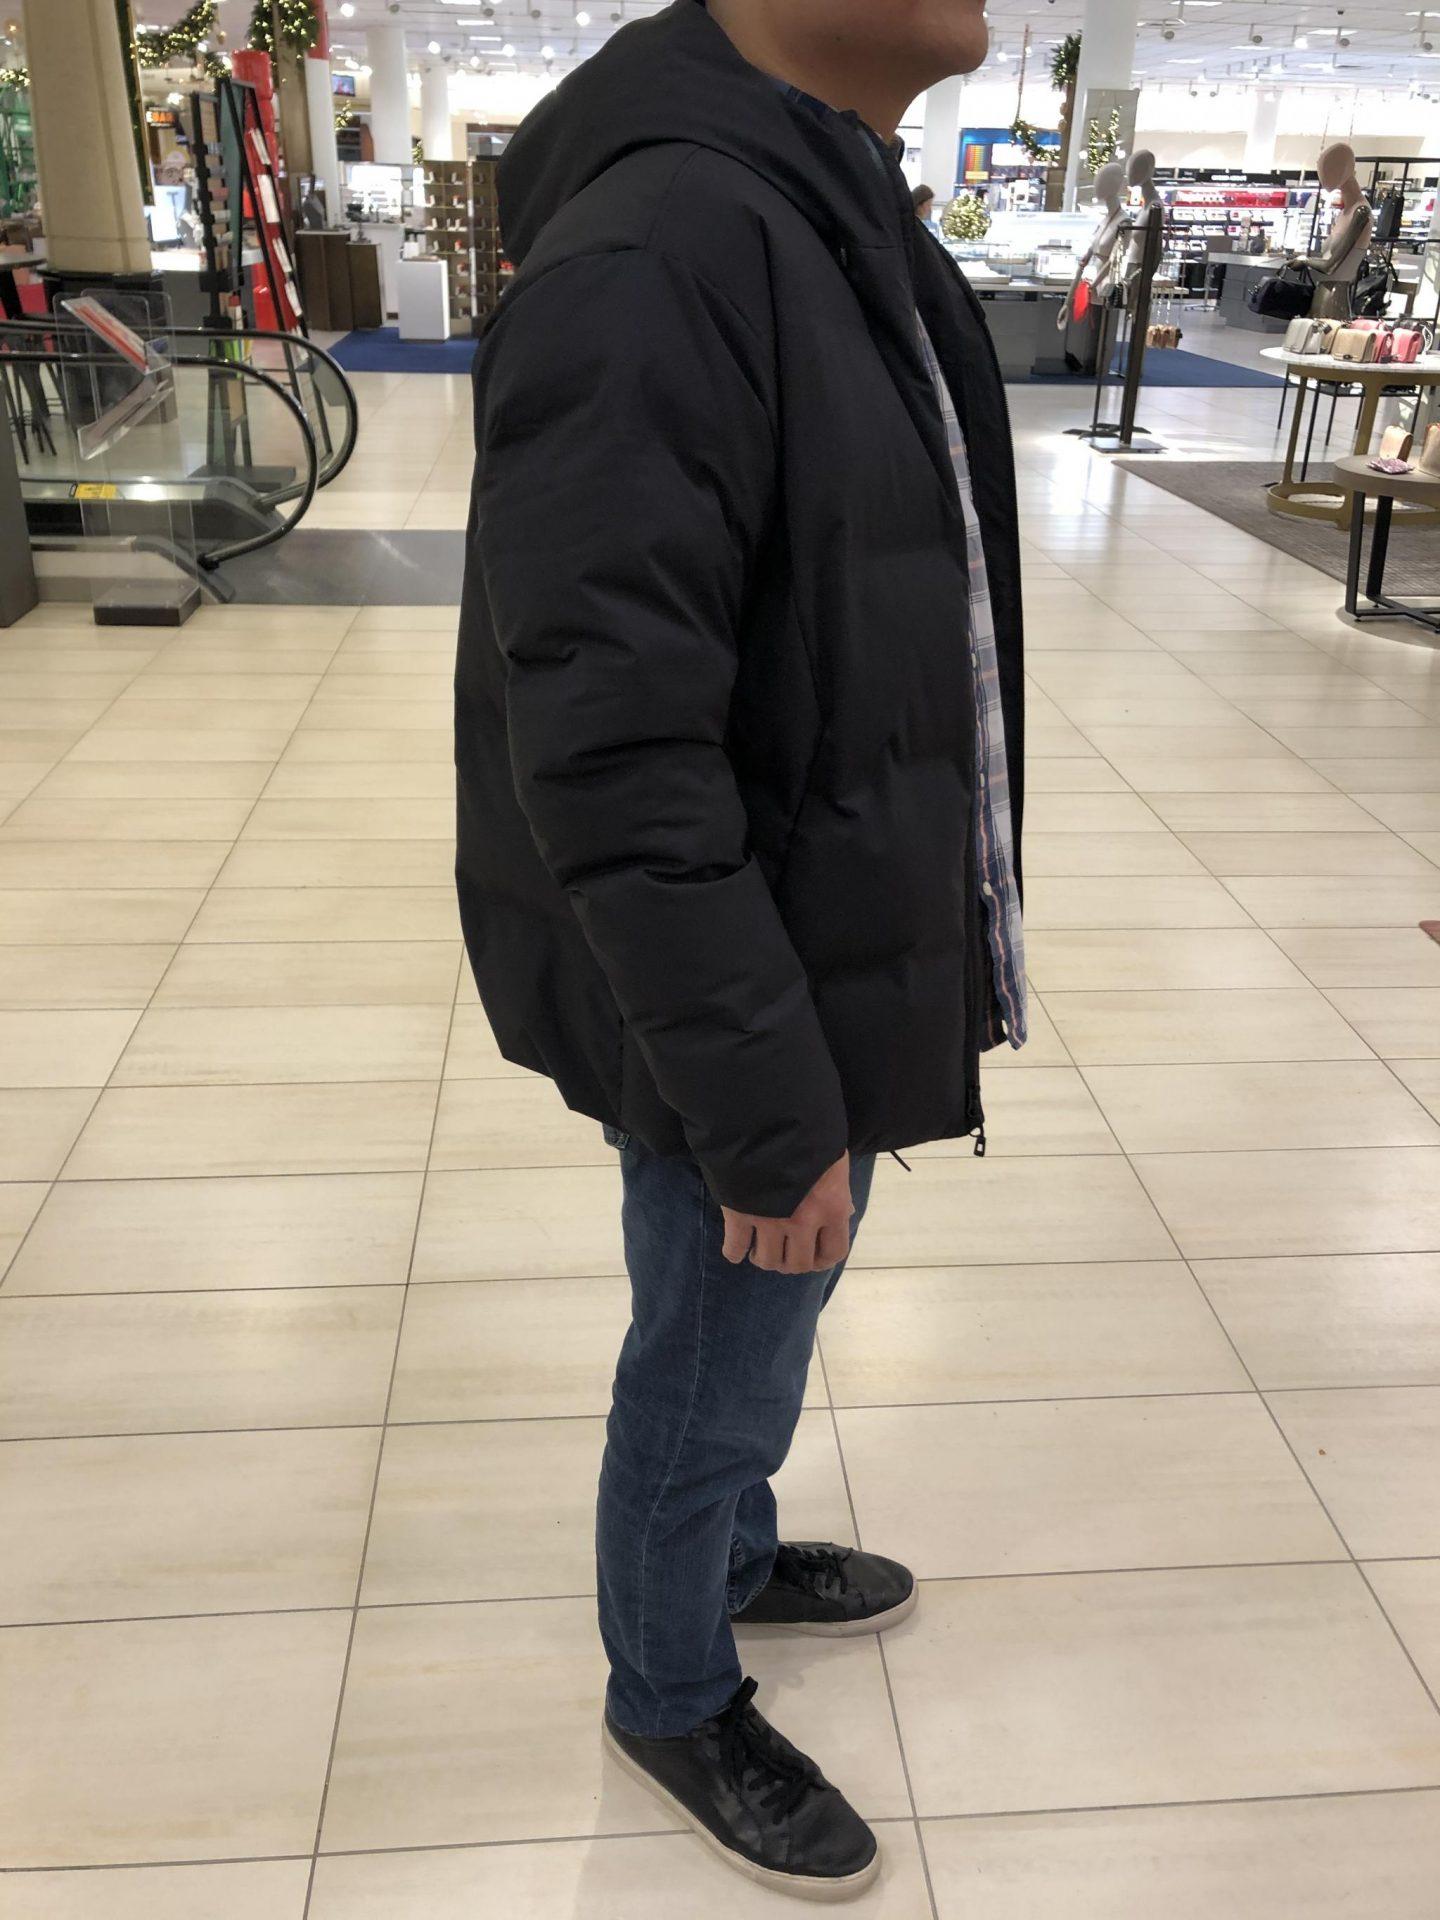 Patagonia Jackson Glacier Jacket, size XL